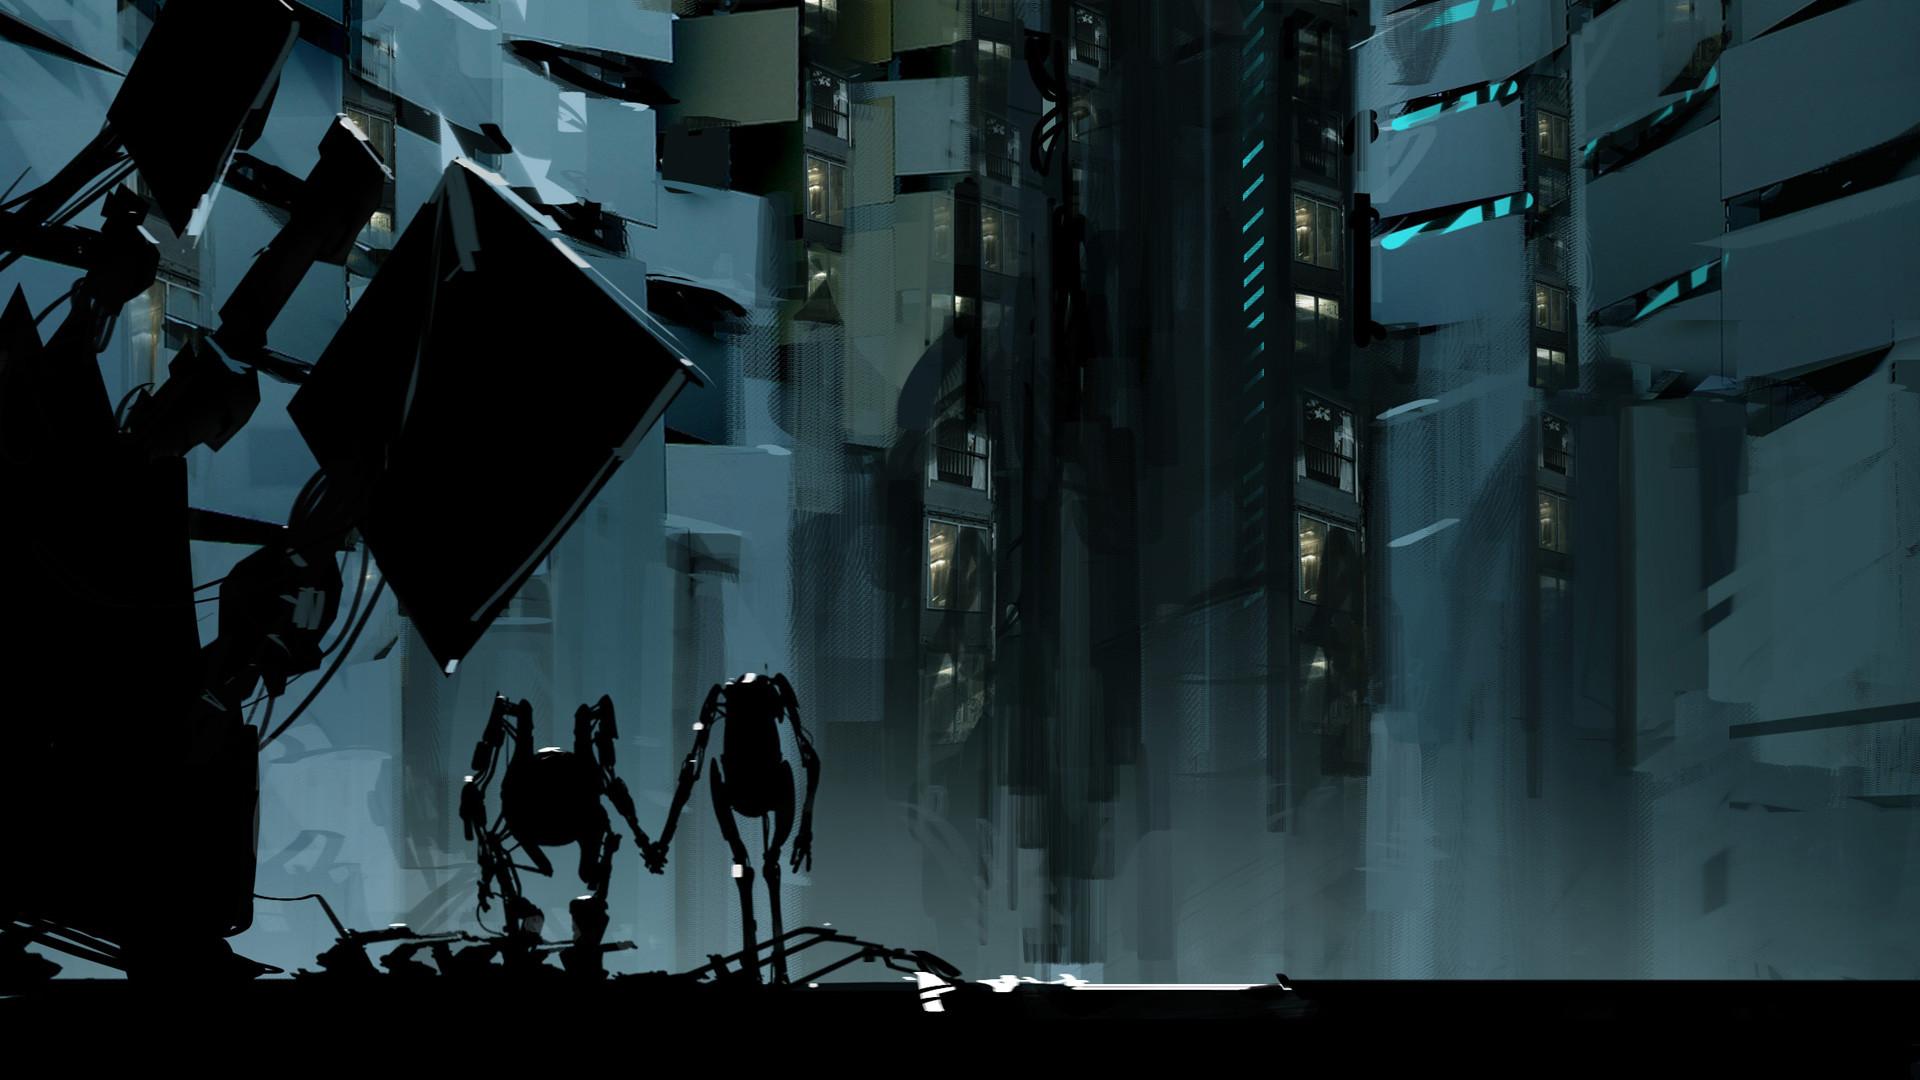 Portal 2 Computer Wallpapers, Desktop Backgrounds ...